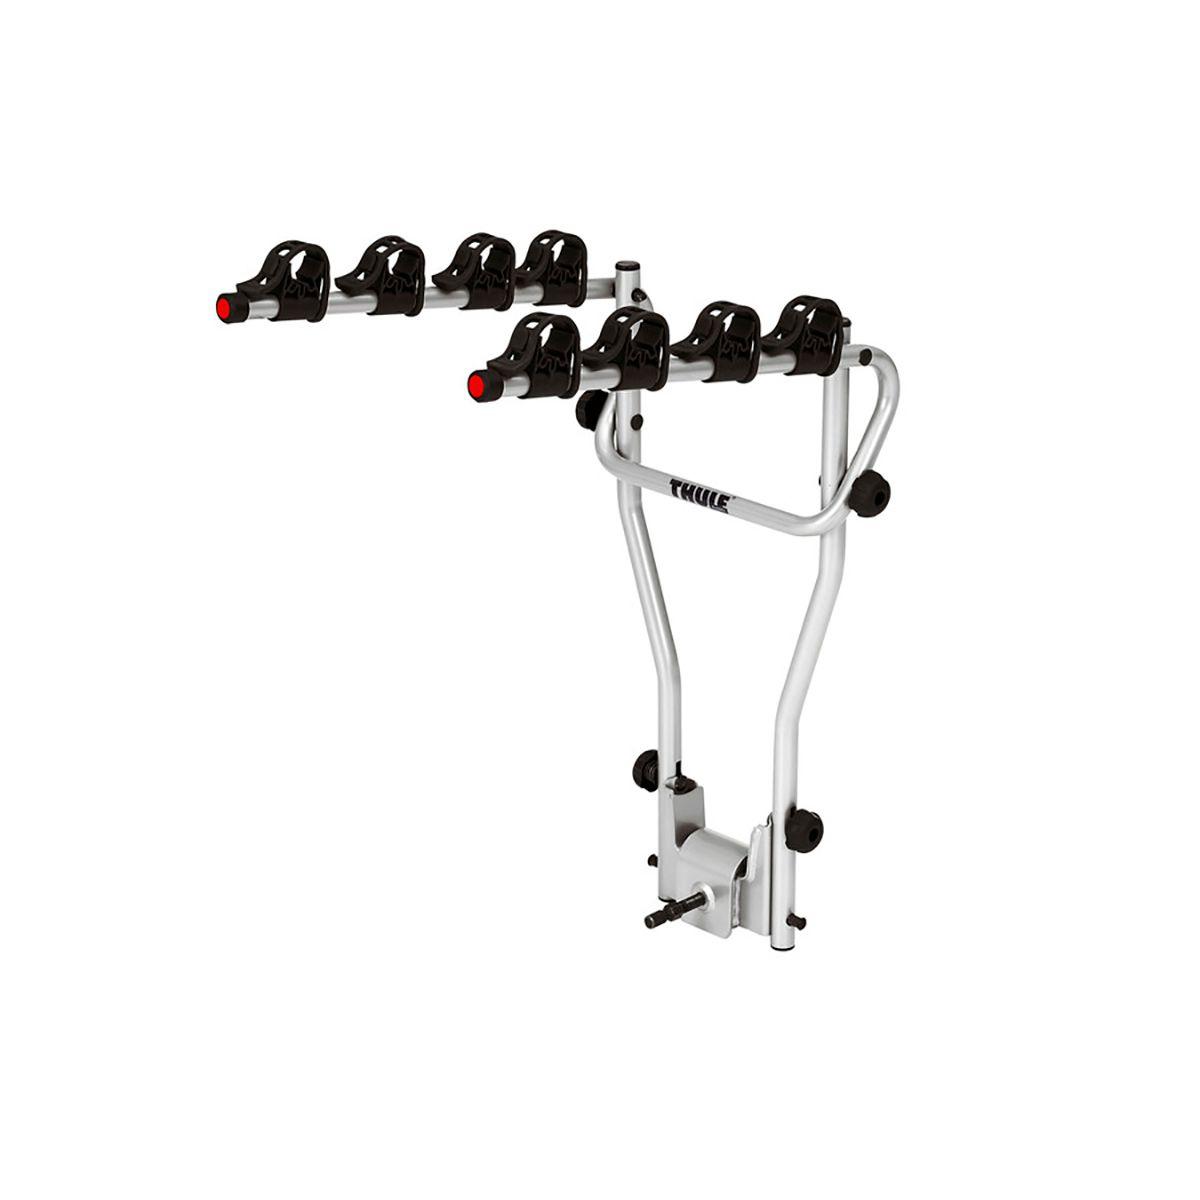 Suporte Para Transporte de Bicicleta Para Engate Thule HangOn Inclinável - 4 Bikes